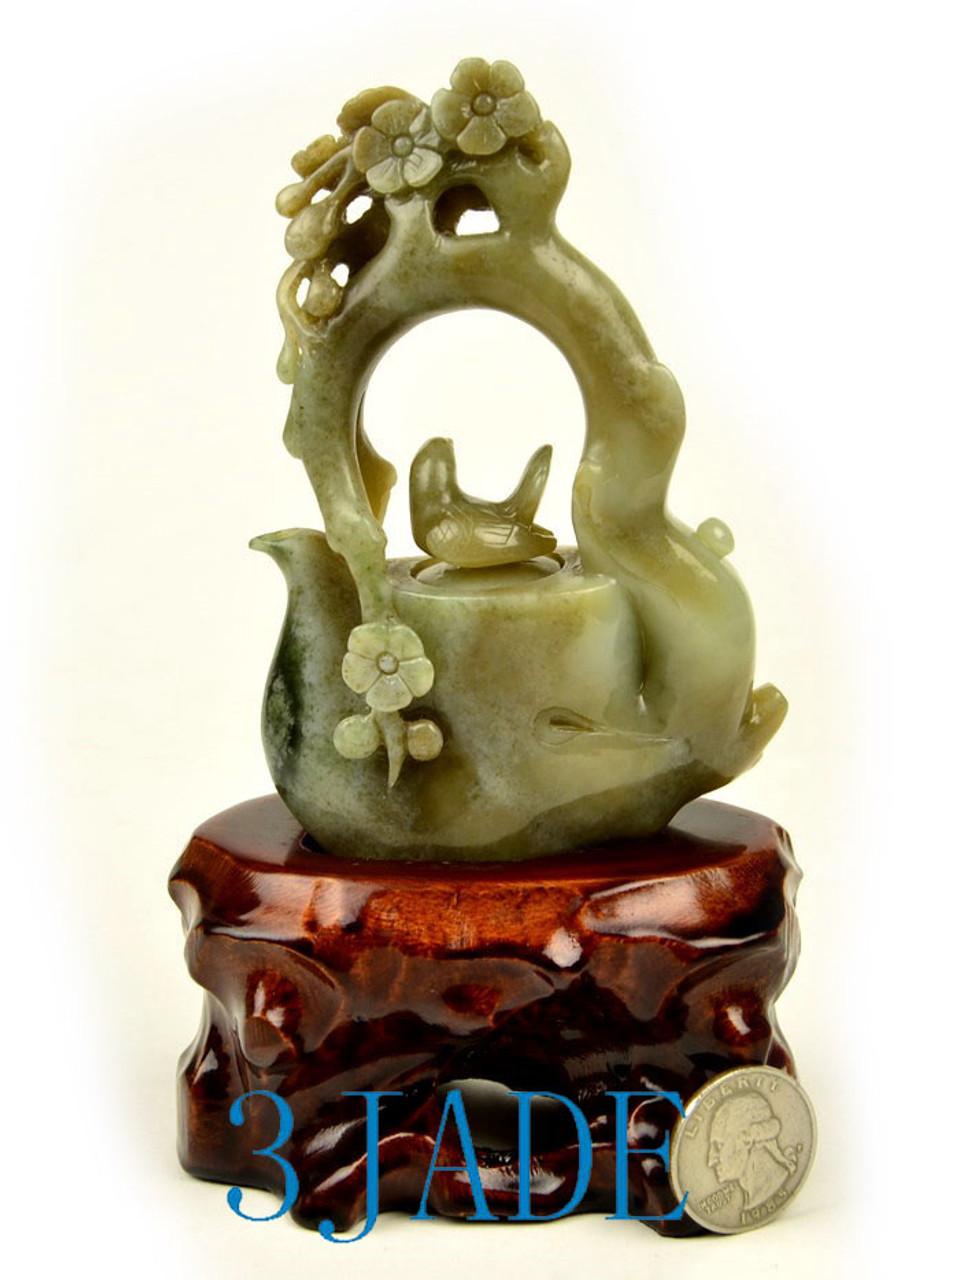 teapot for displaying